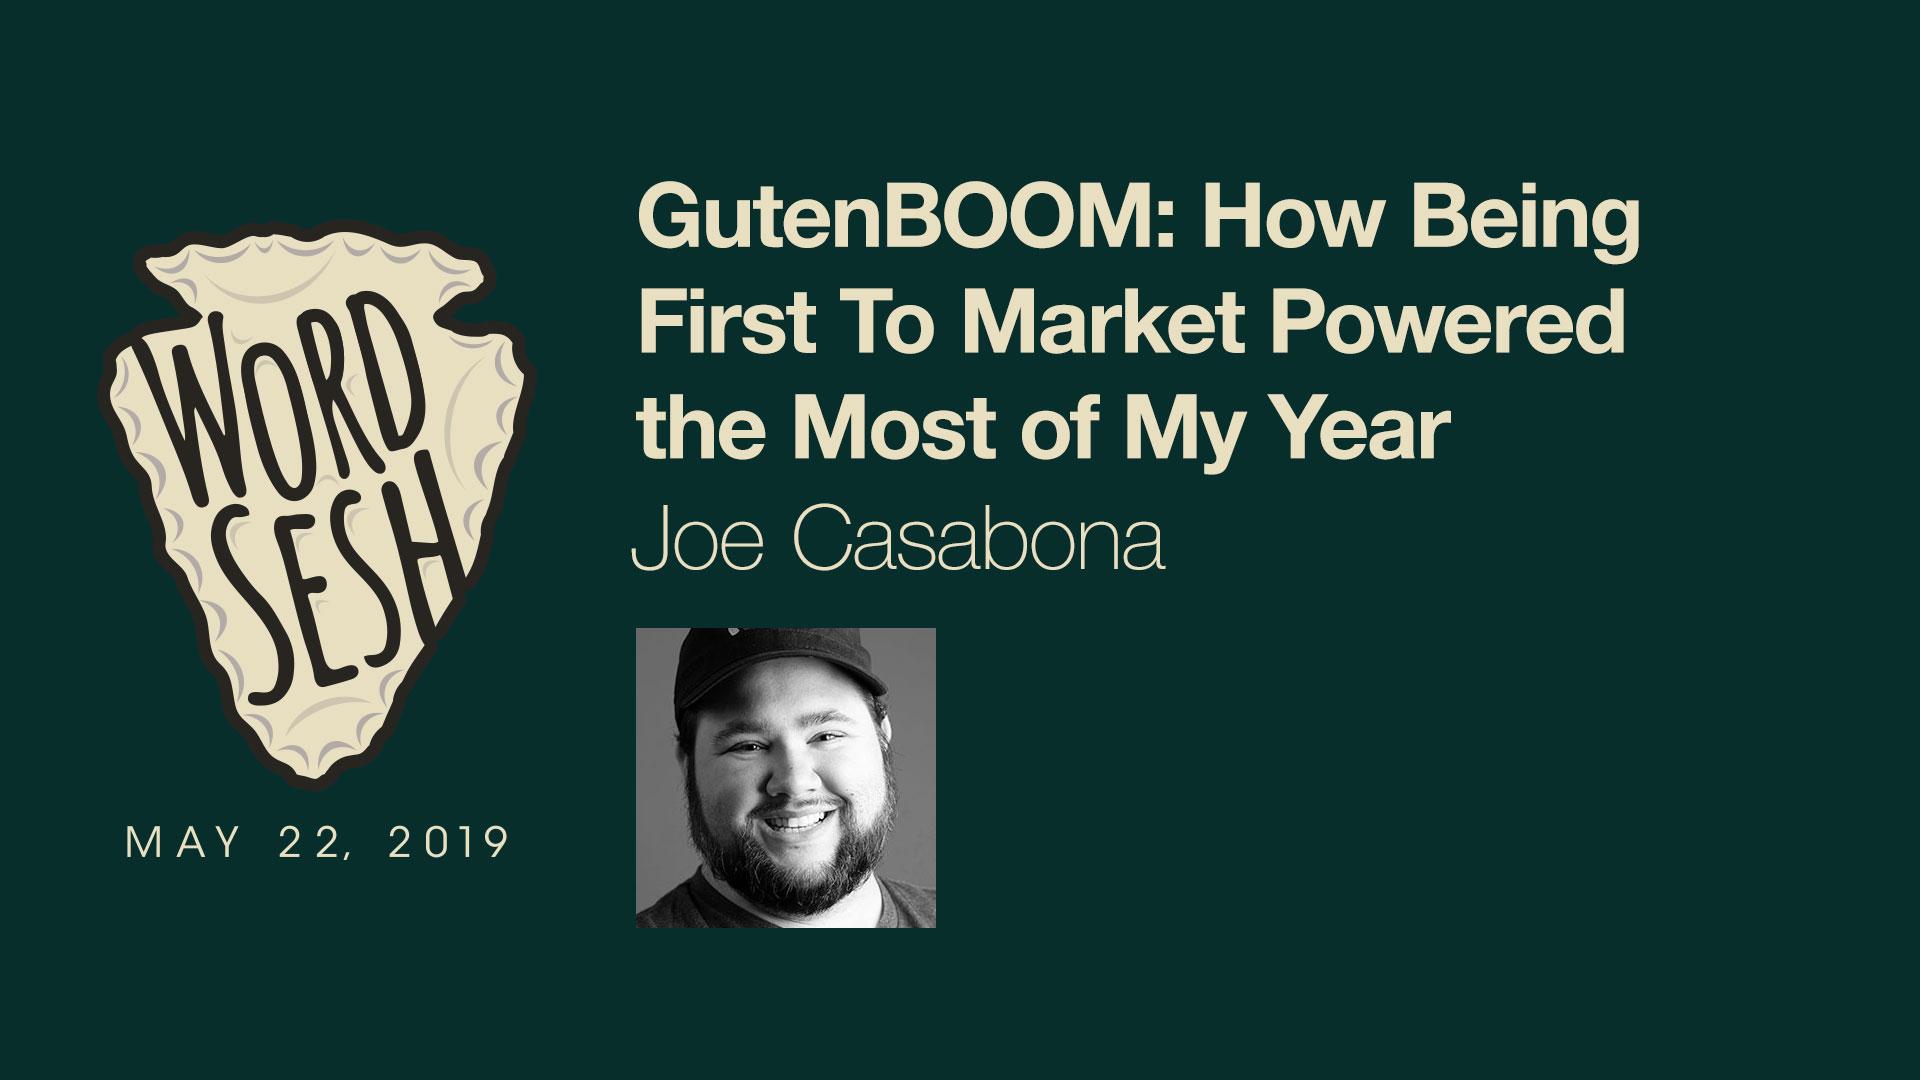 00-04-WordSesh-GutenBOOM-Joe-Casabona